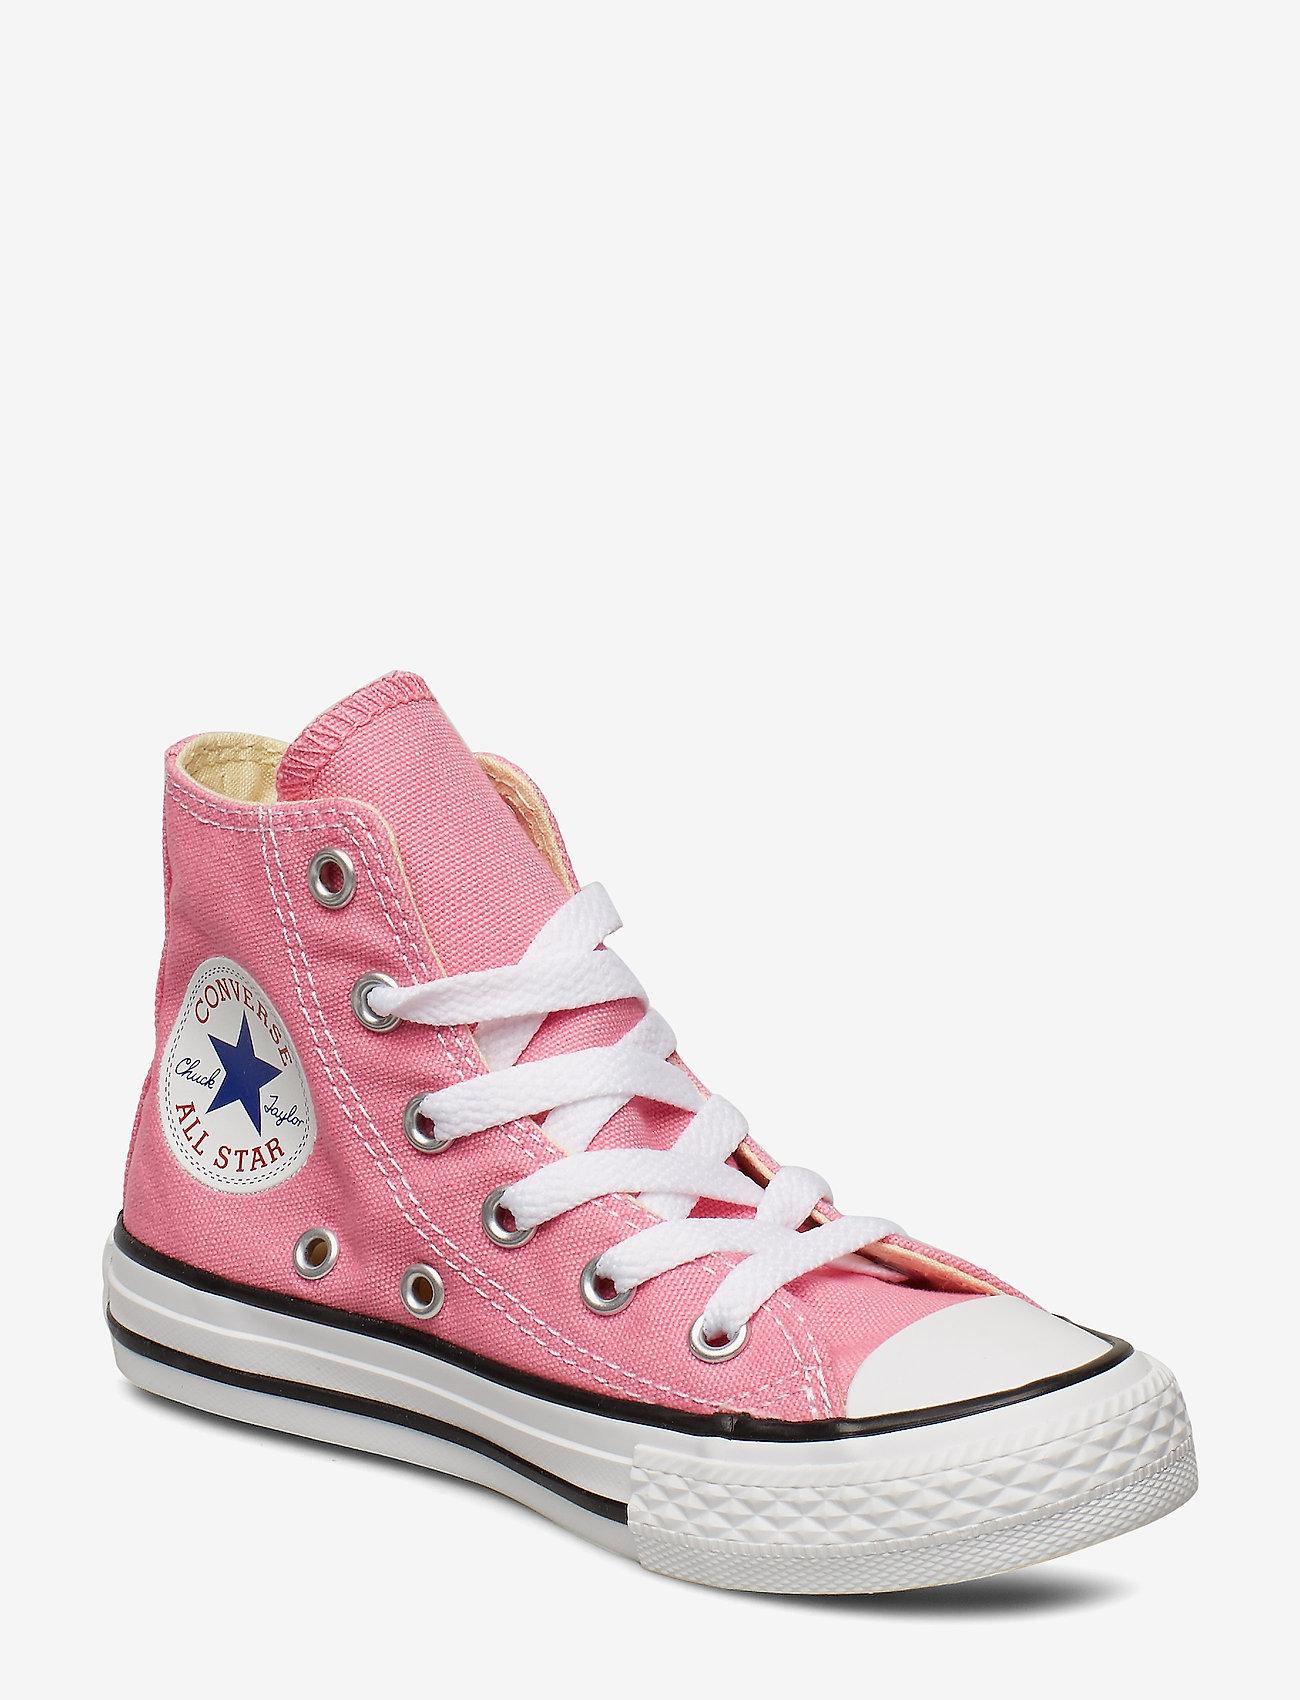 Converse - YTHS C/T ALLSTAR HI - sneakers - pink - 0